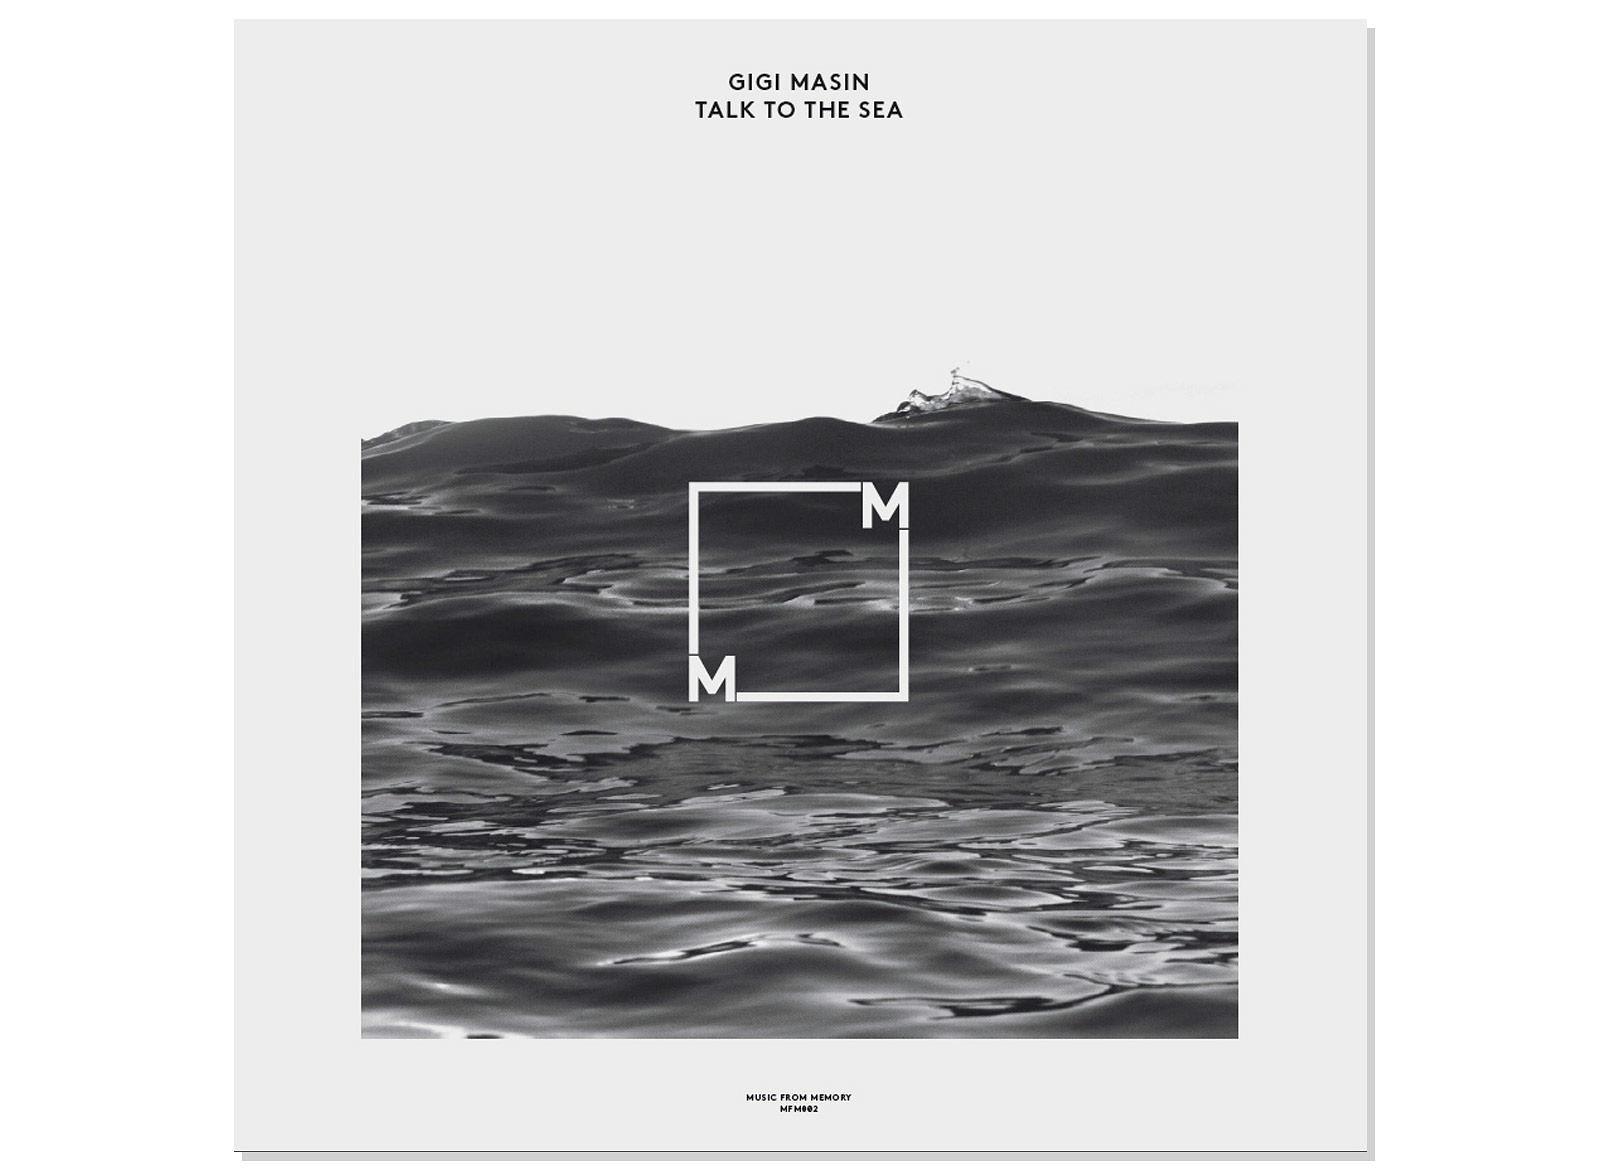 Talk to the Sea, Gigi Masin